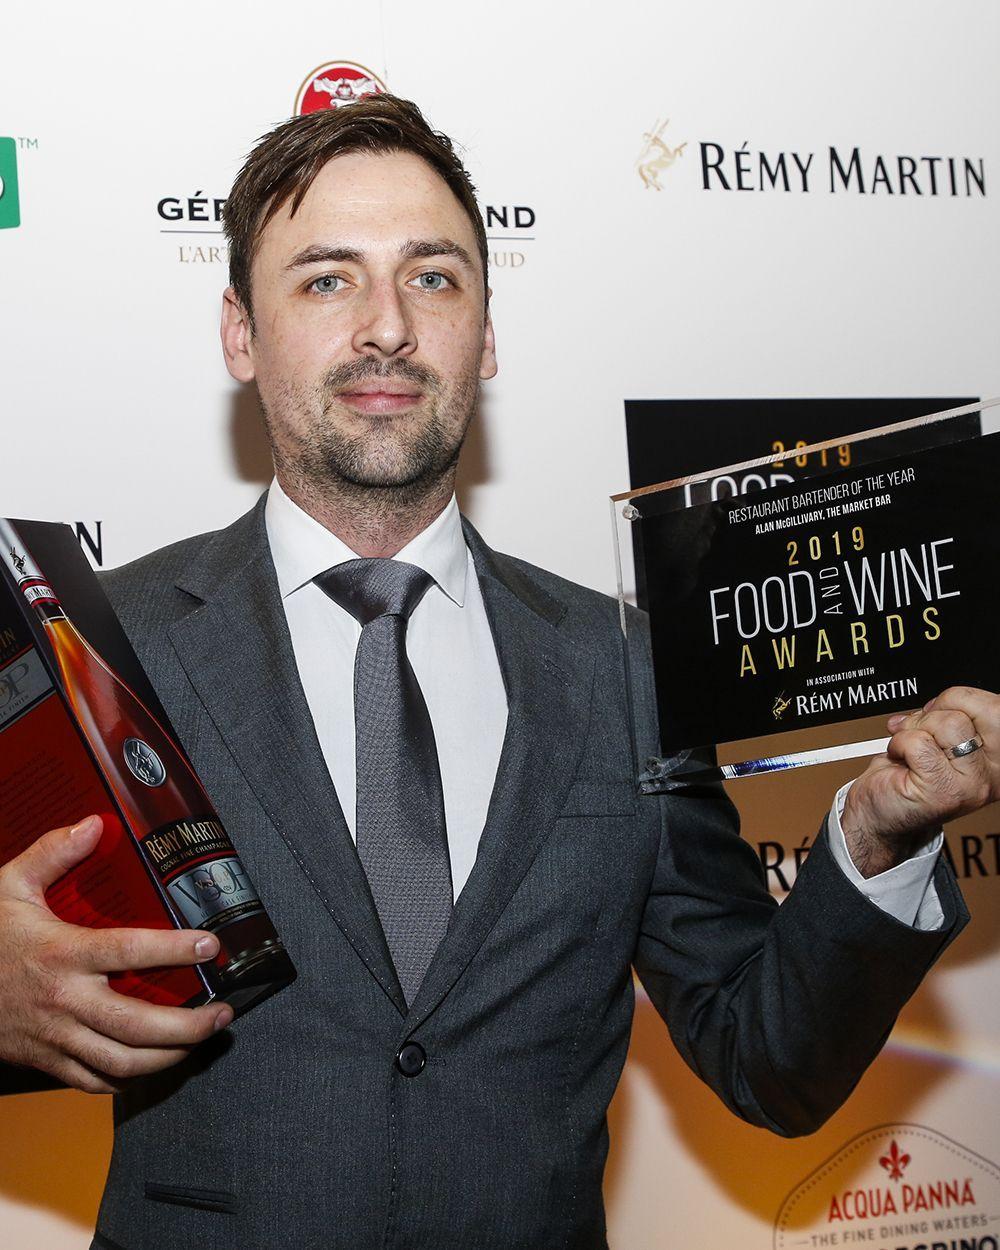 Alan_mcgillicvary_122_food_and_wine_awards_main_edit